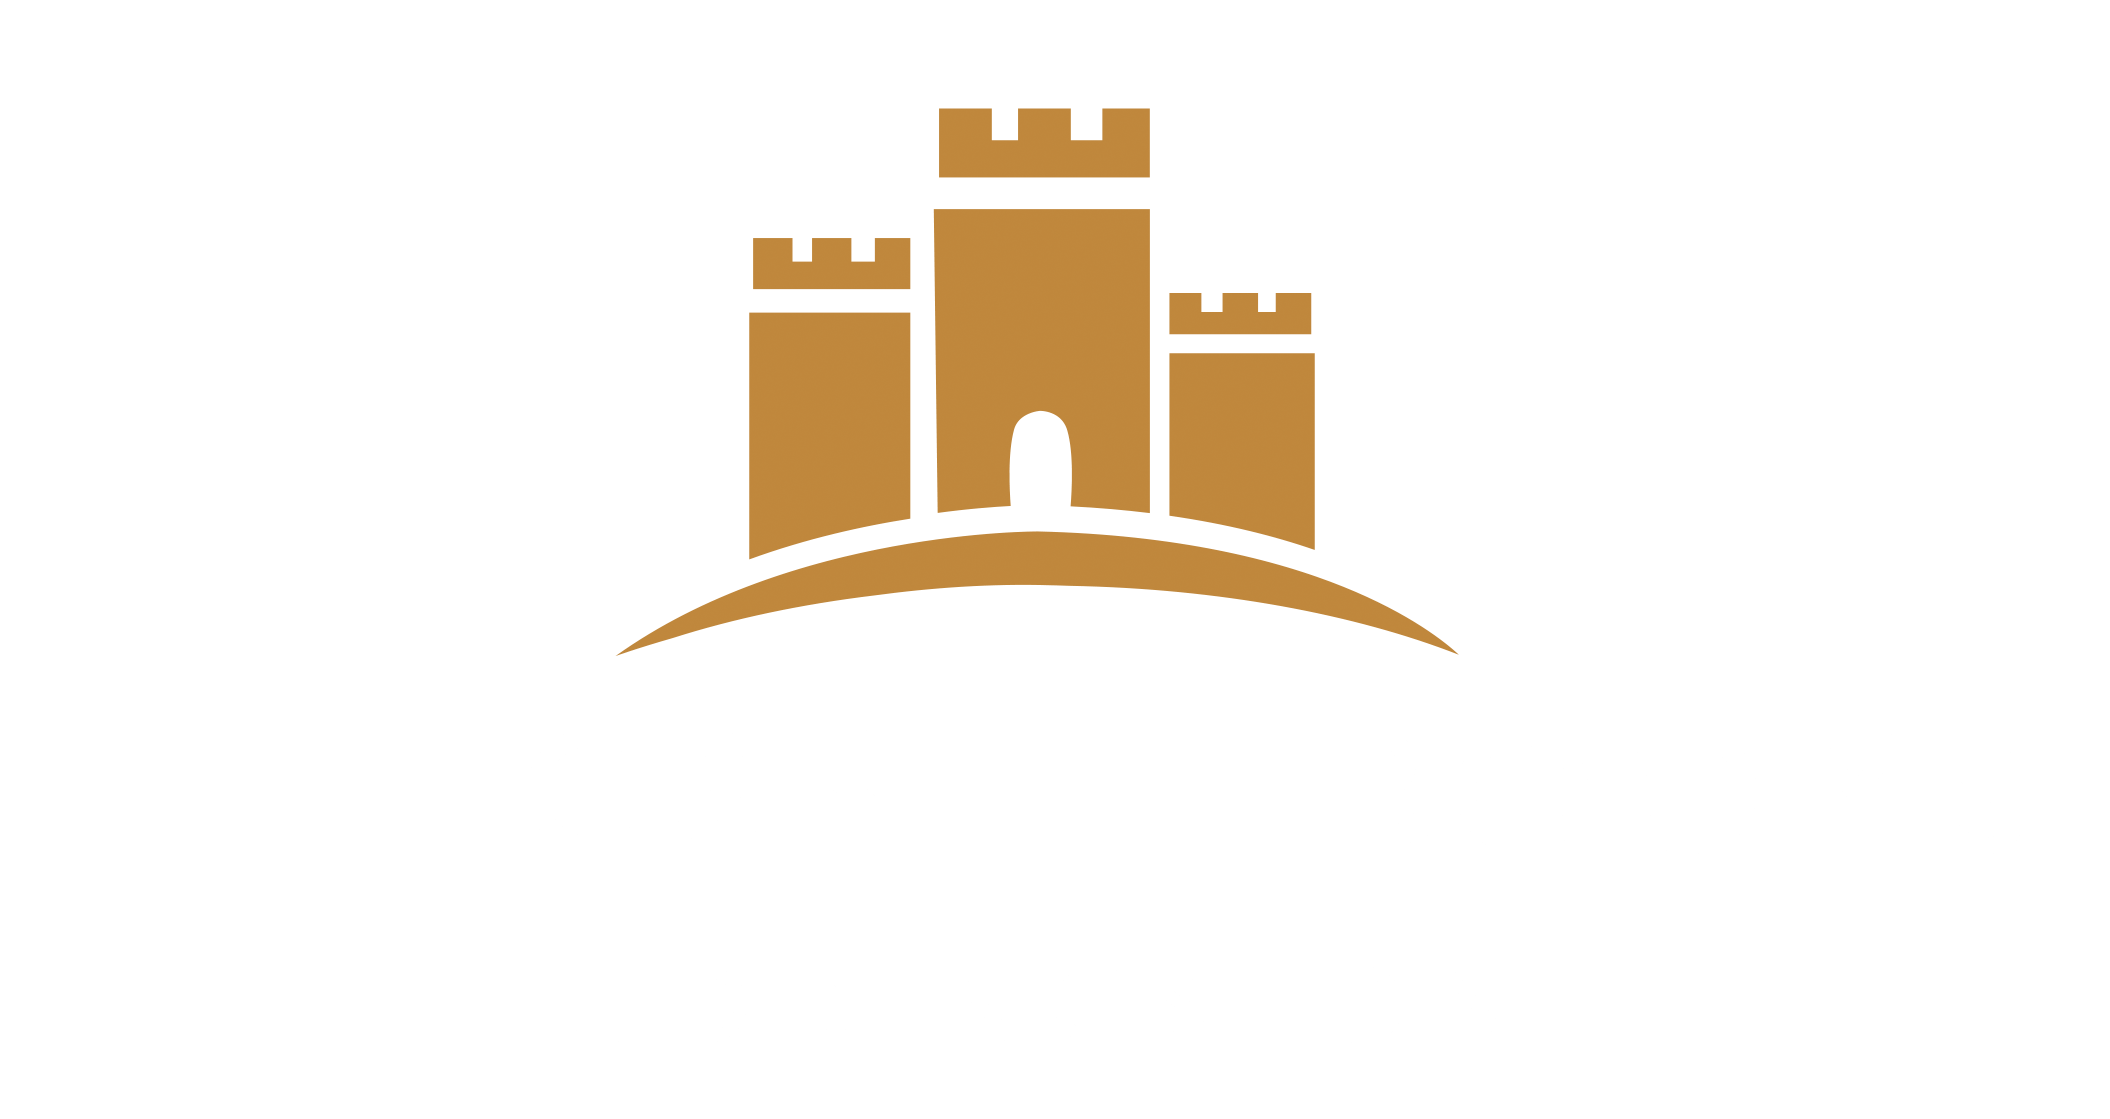 The Castle Rooms, Uddingston